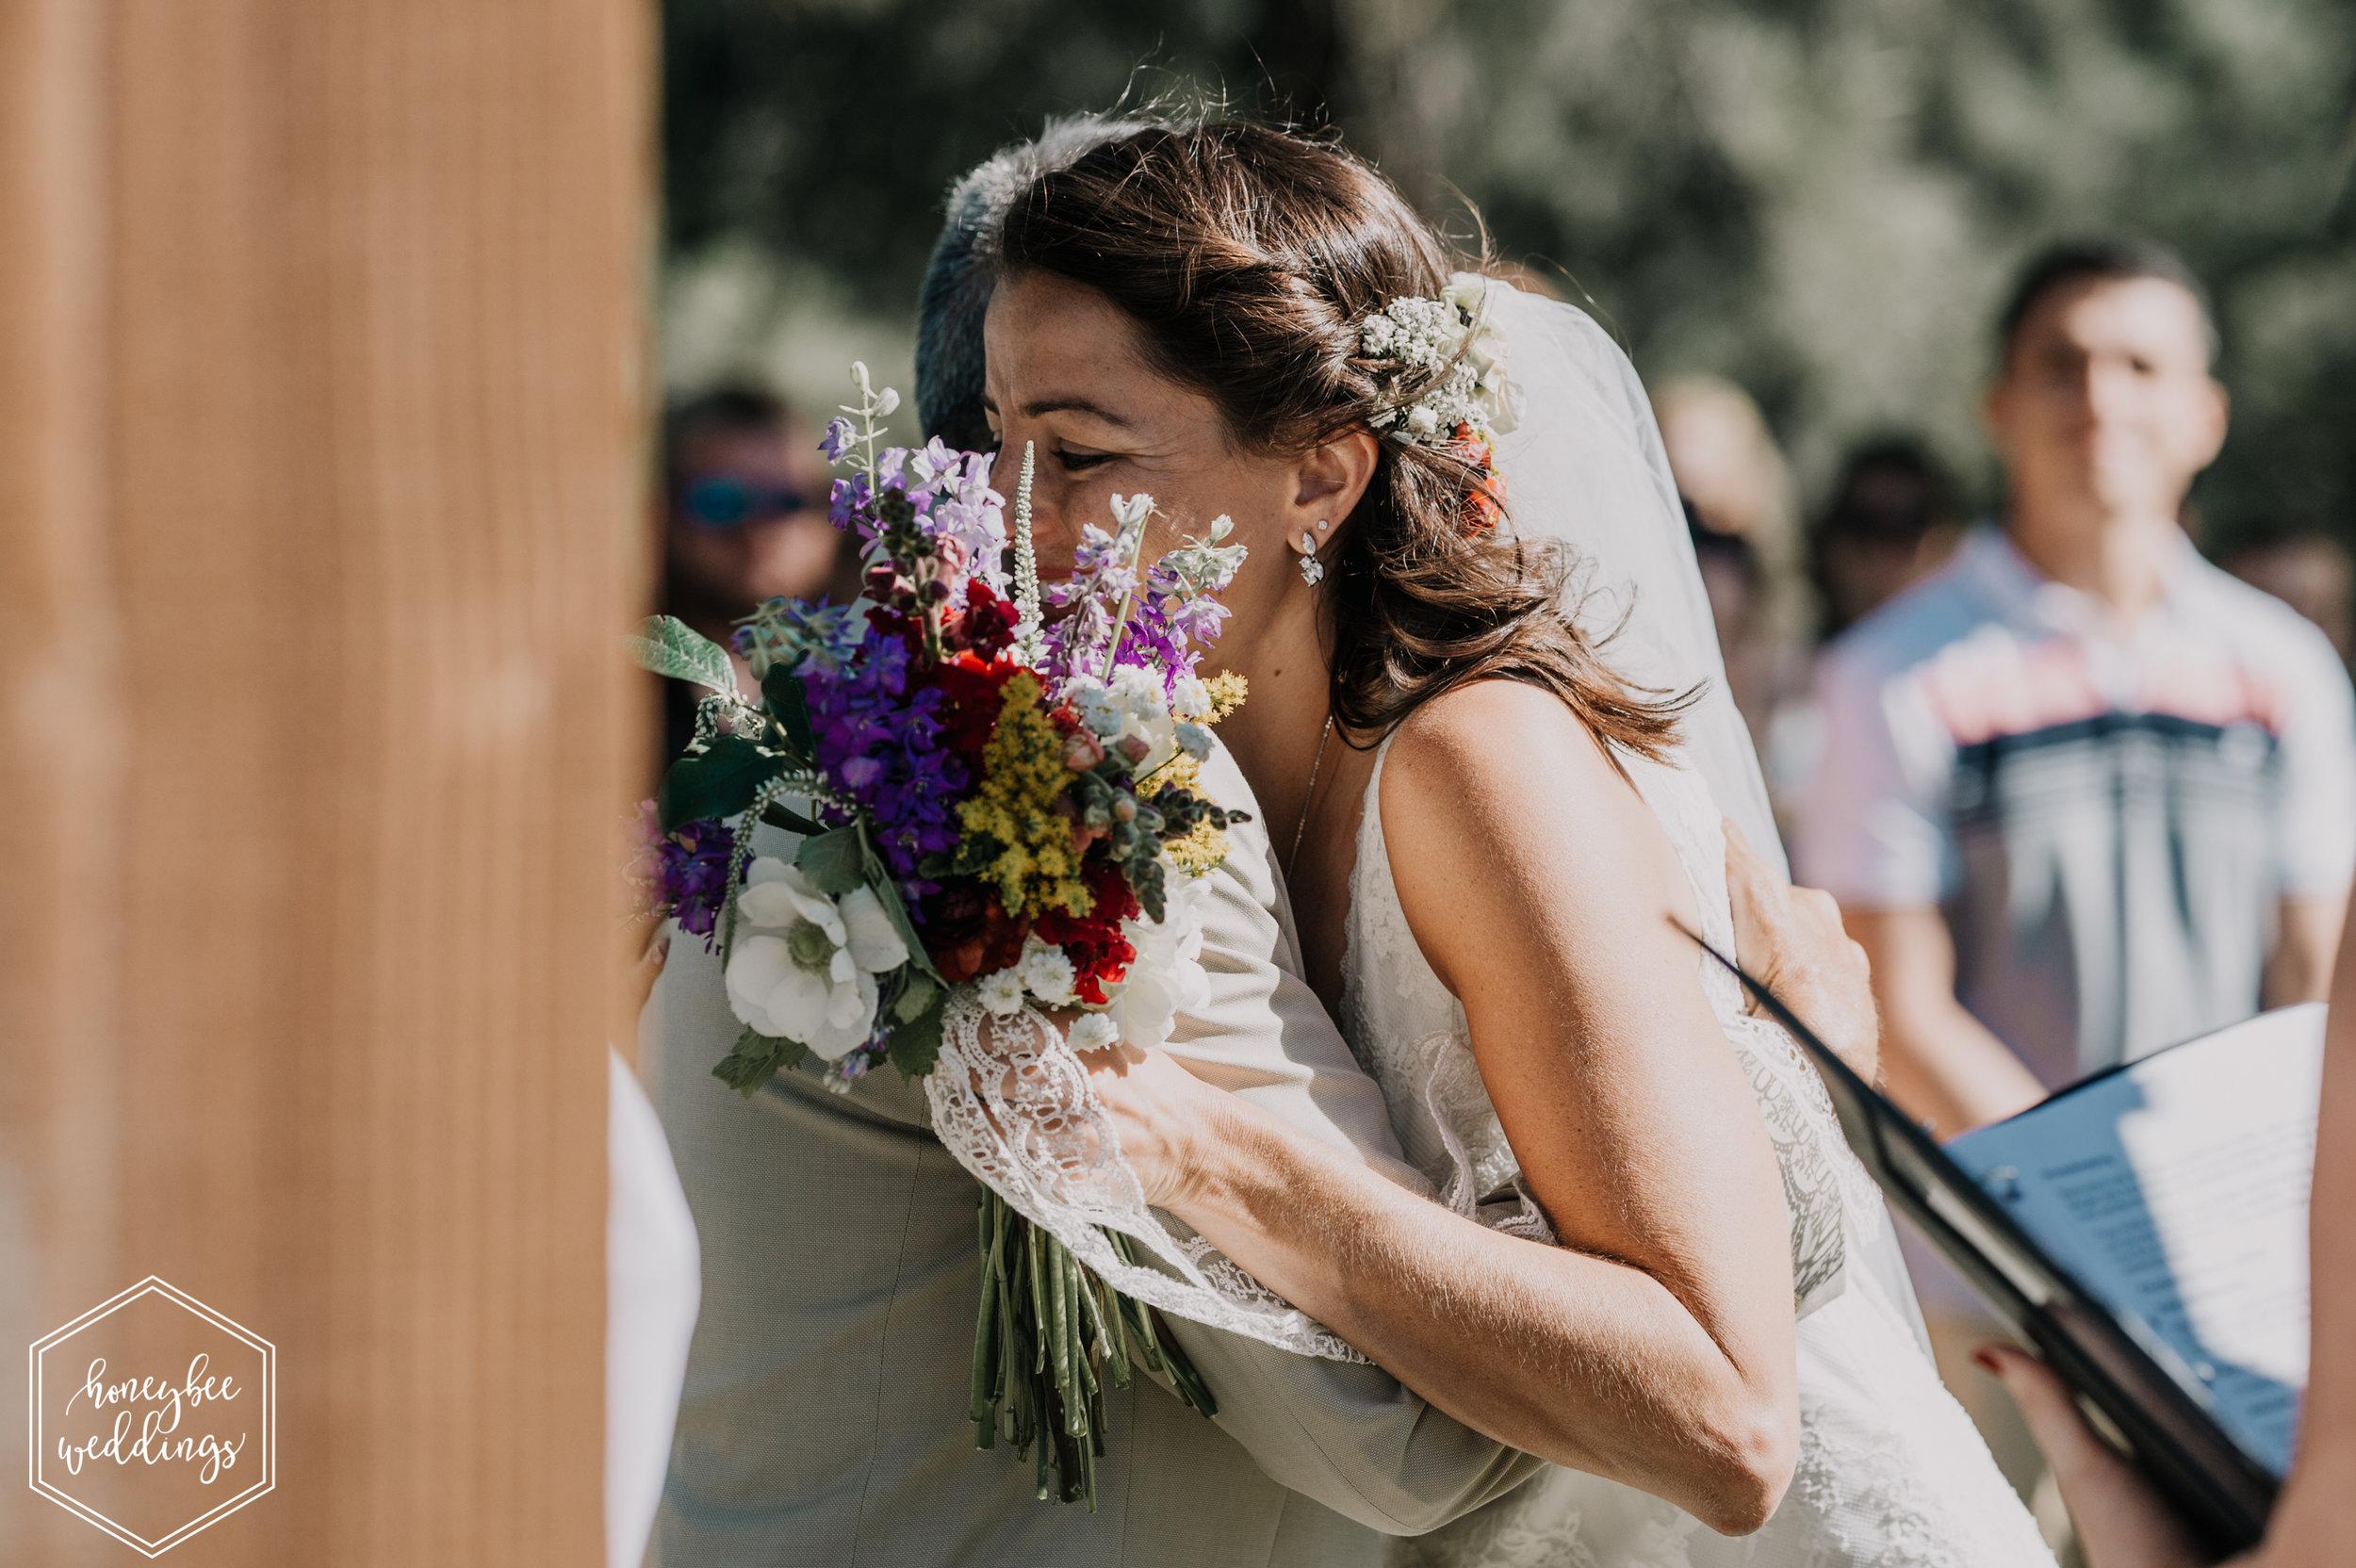 305 White Raven Wedding_Montana Wedding Photographer_Honeybee Weddings_ Meghan Maloney + Arza Hammond 2018-8693.jpg